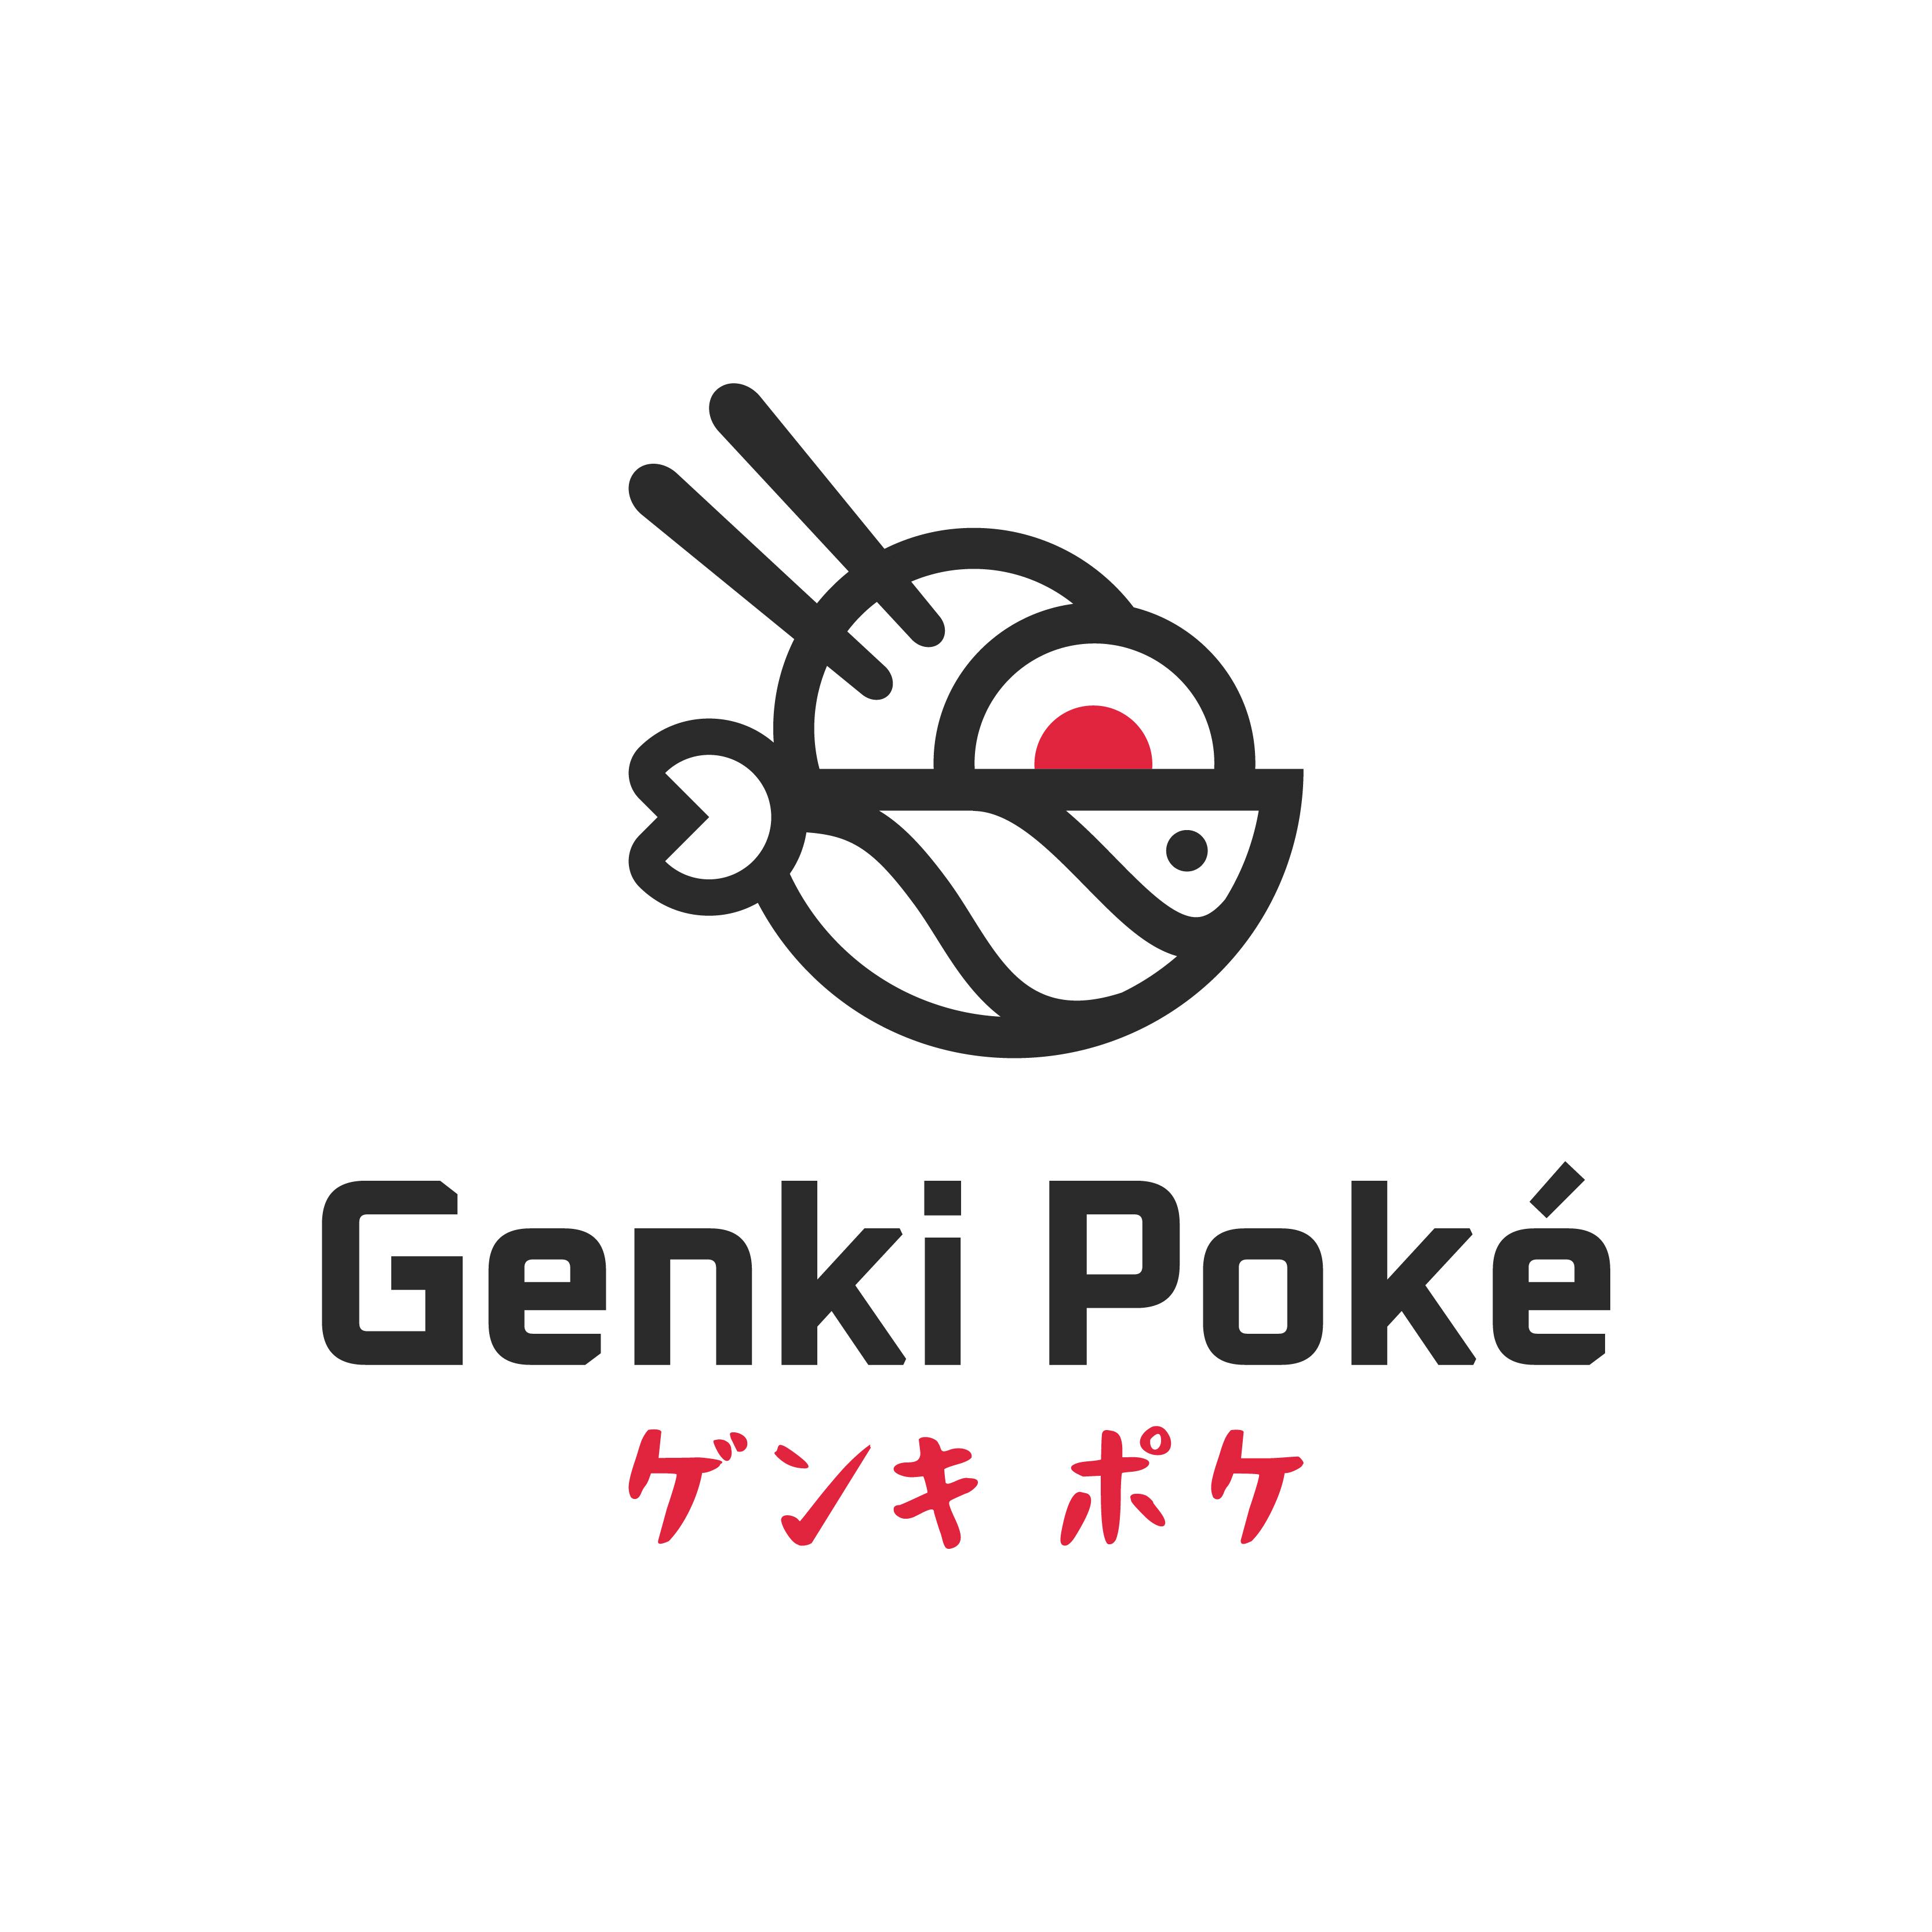 Genki Poke